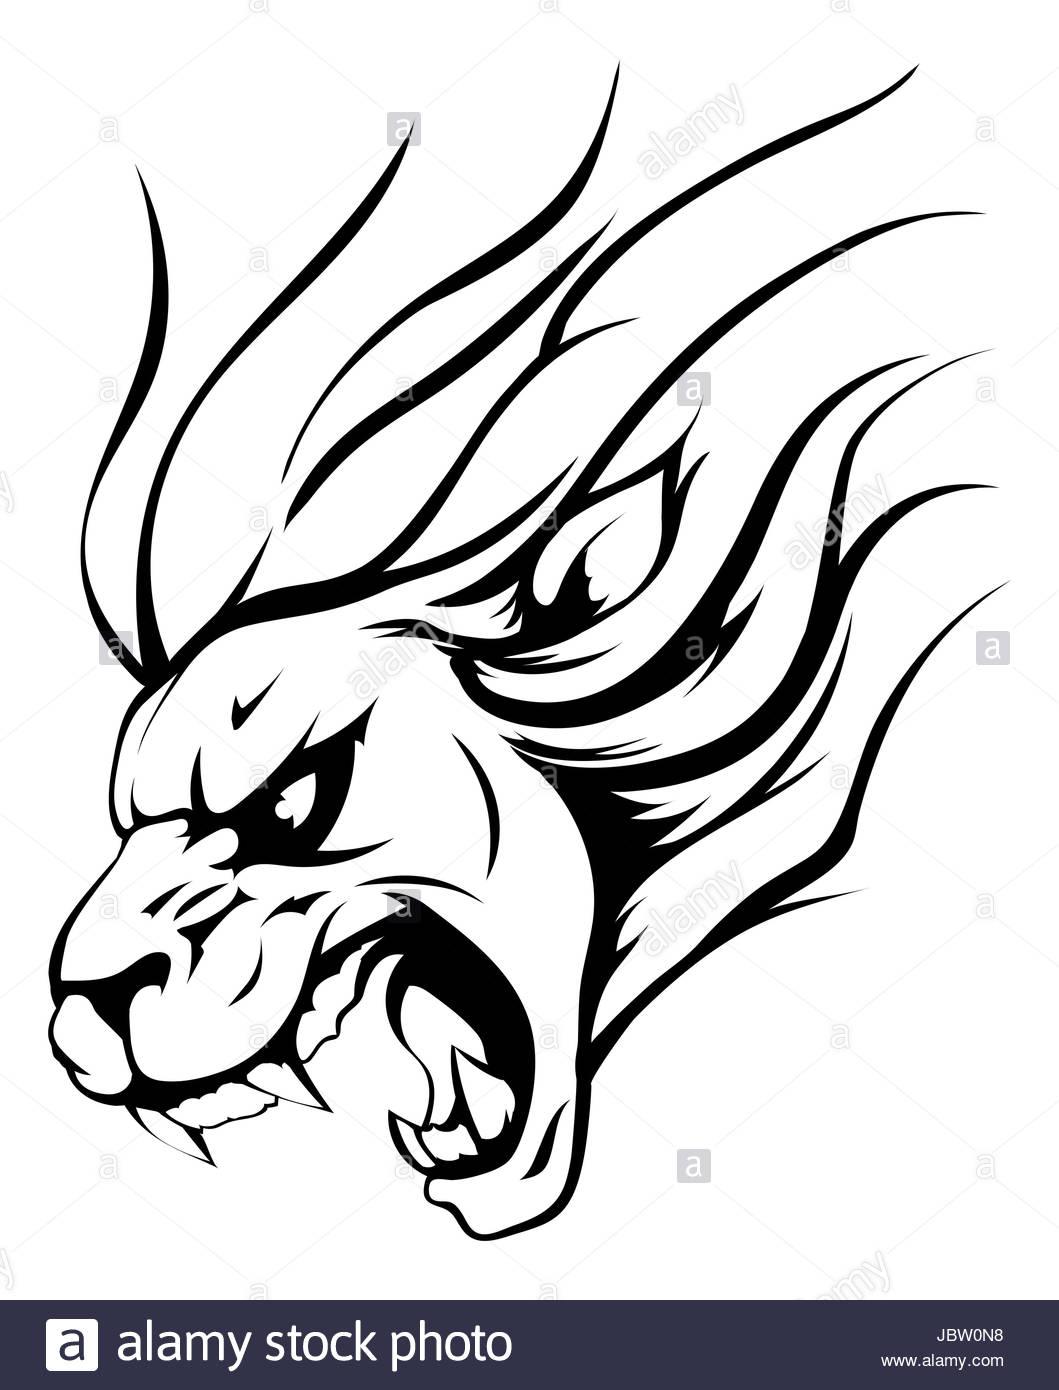 1059x1390 Lion Mane Illustration. Vector Predator Abstract Portrait Stock